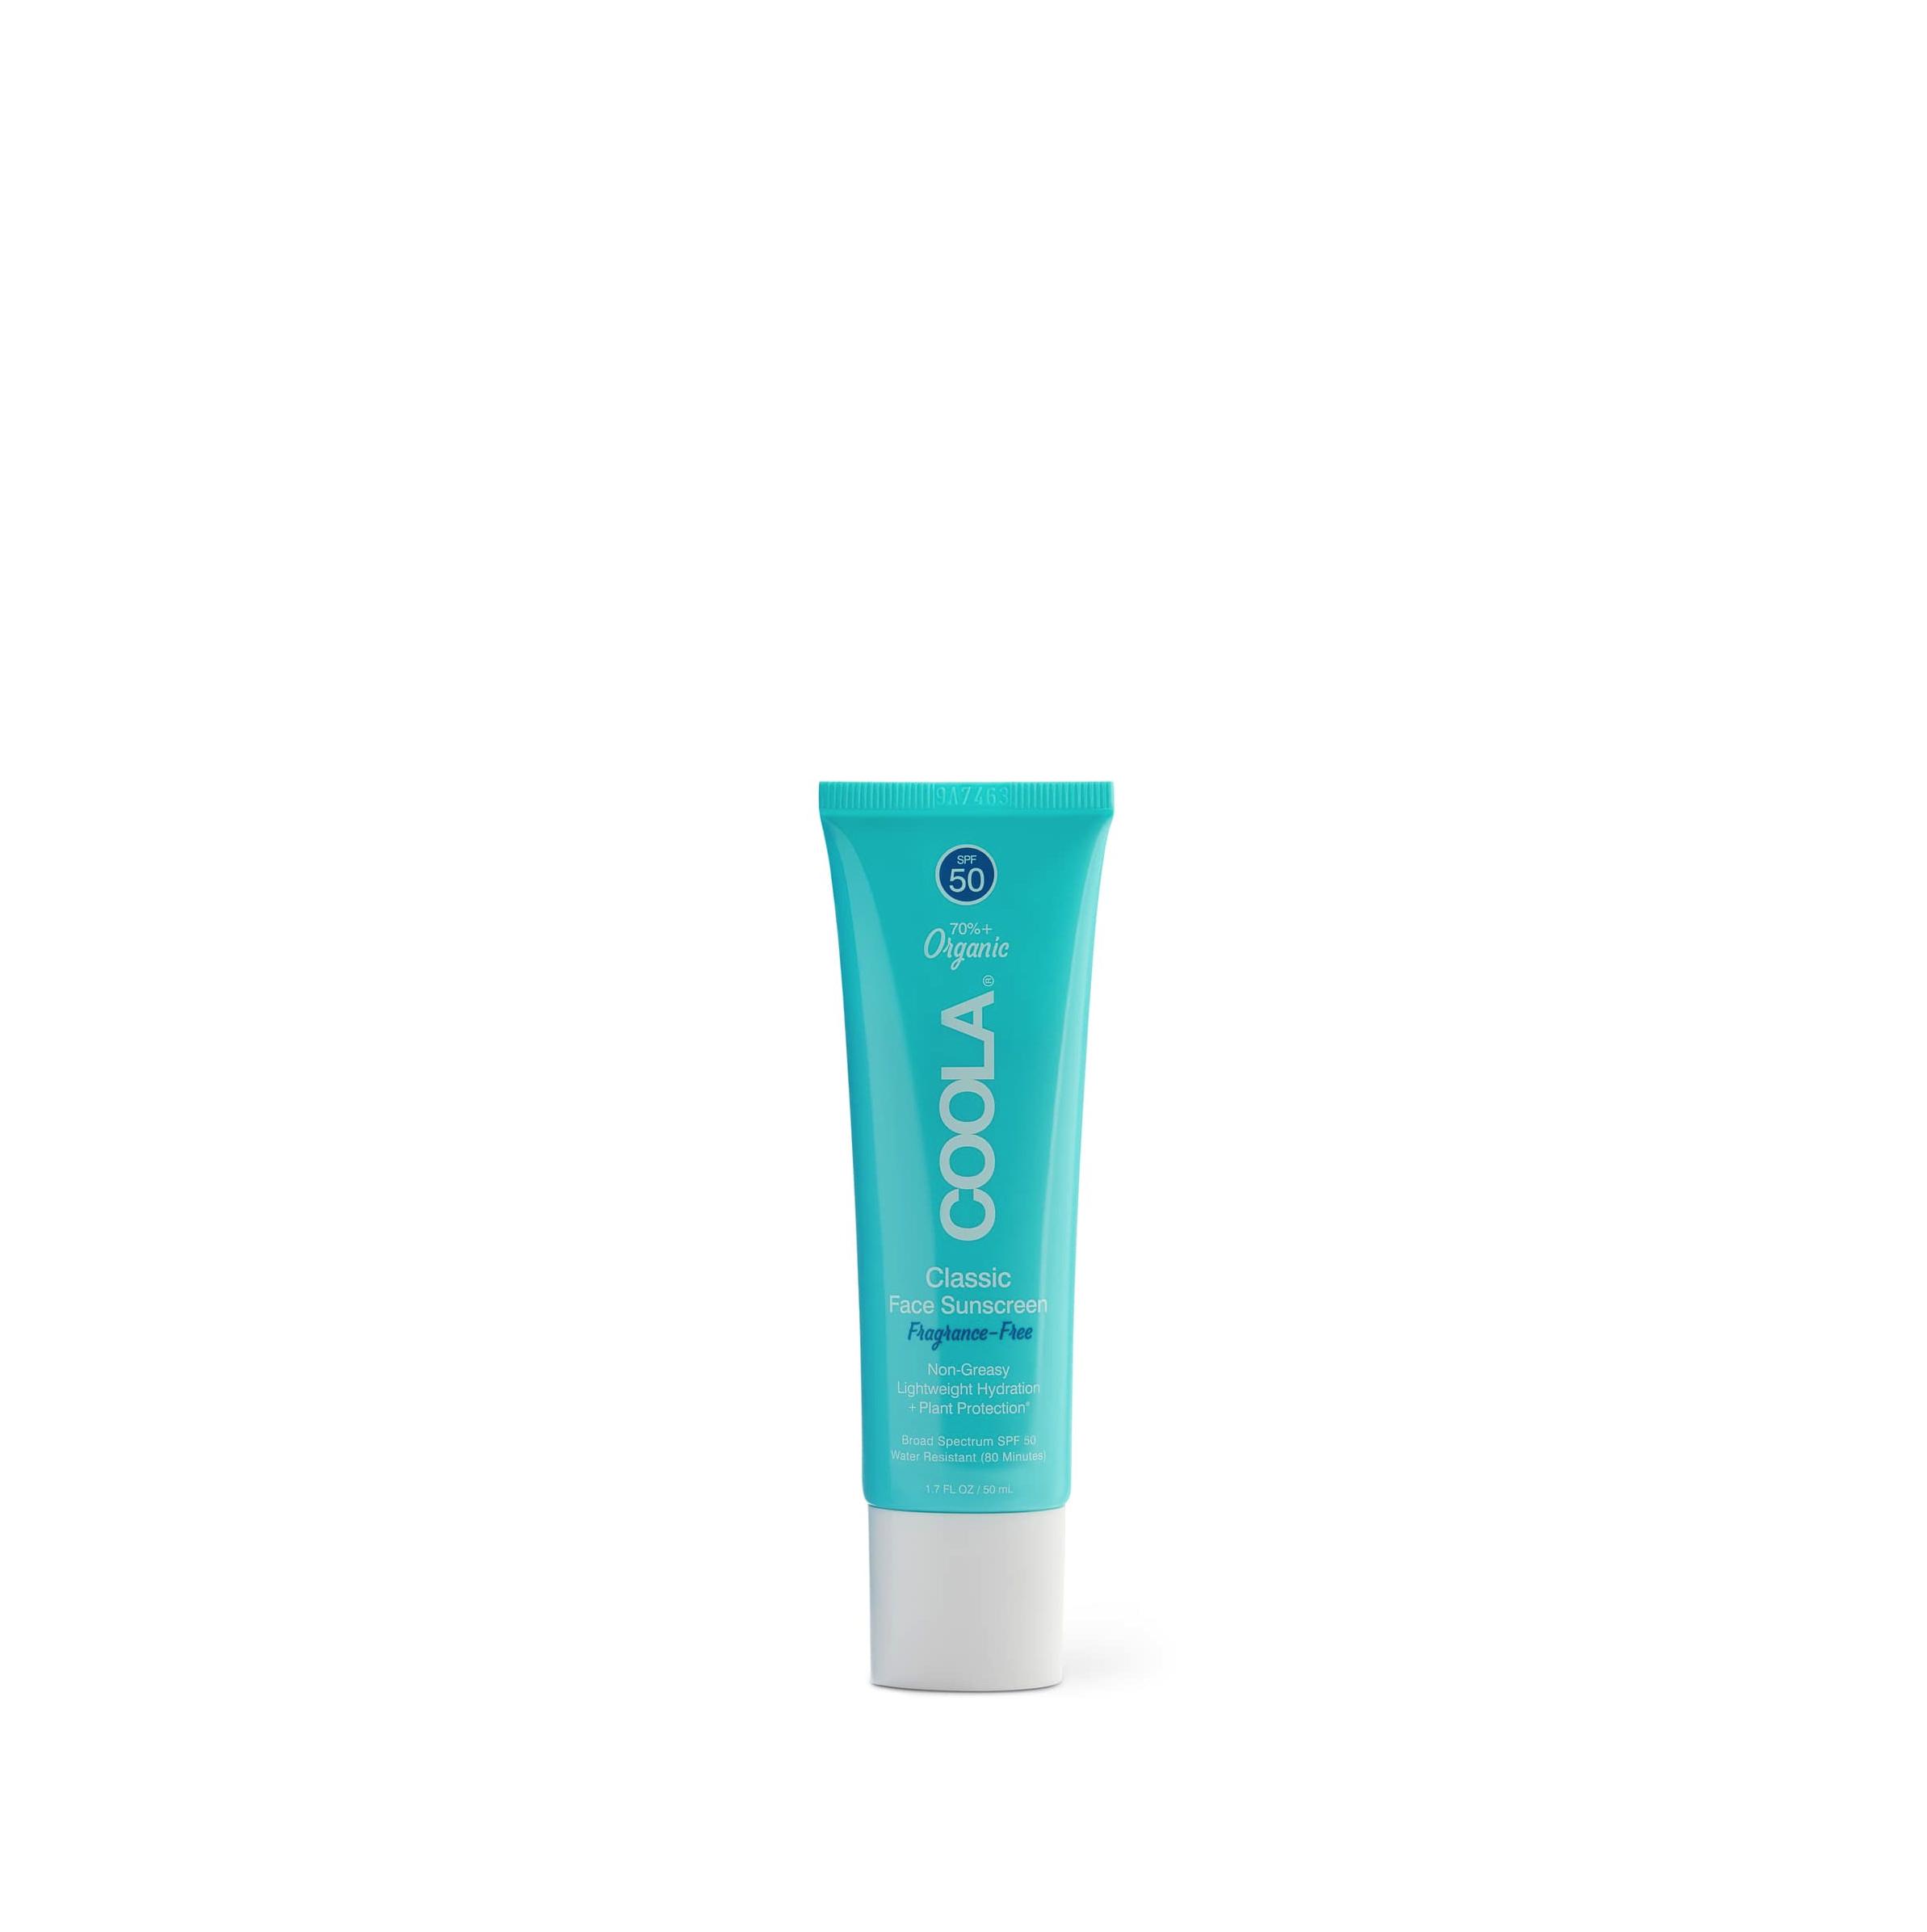 Organic Sunscreen for Face